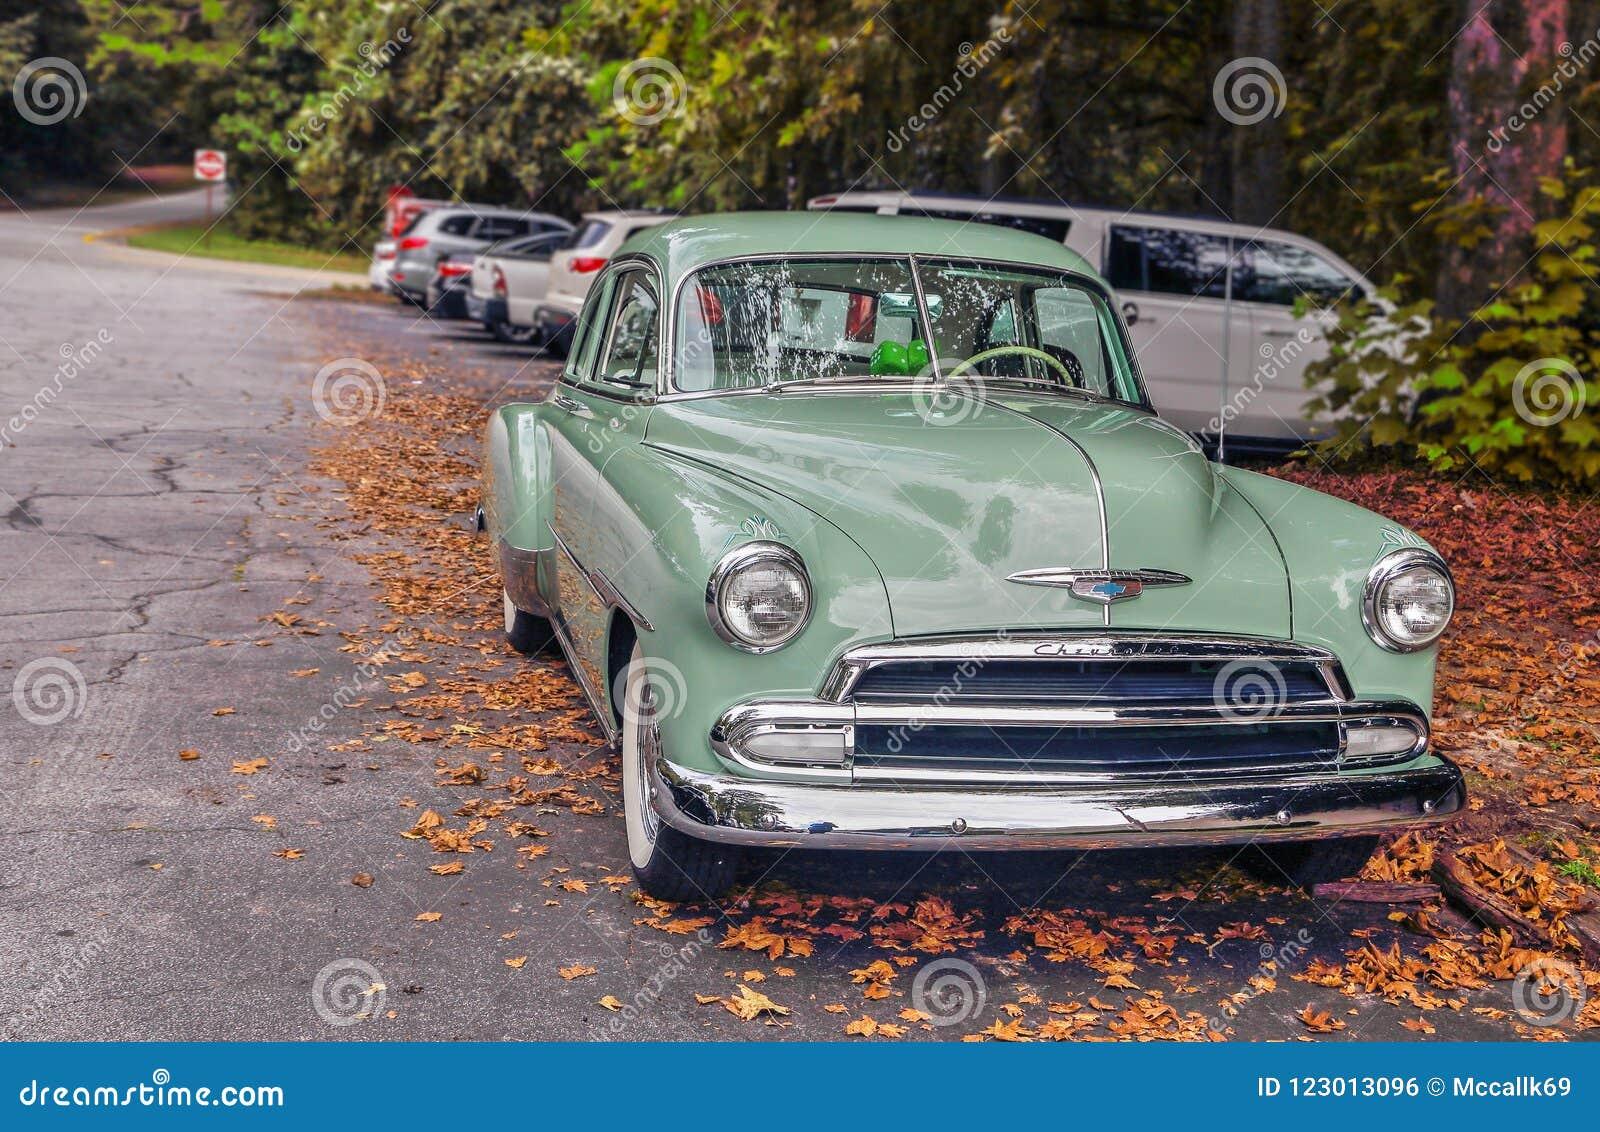 Chevy Deluxe Mint Green nittonhundrafemtio